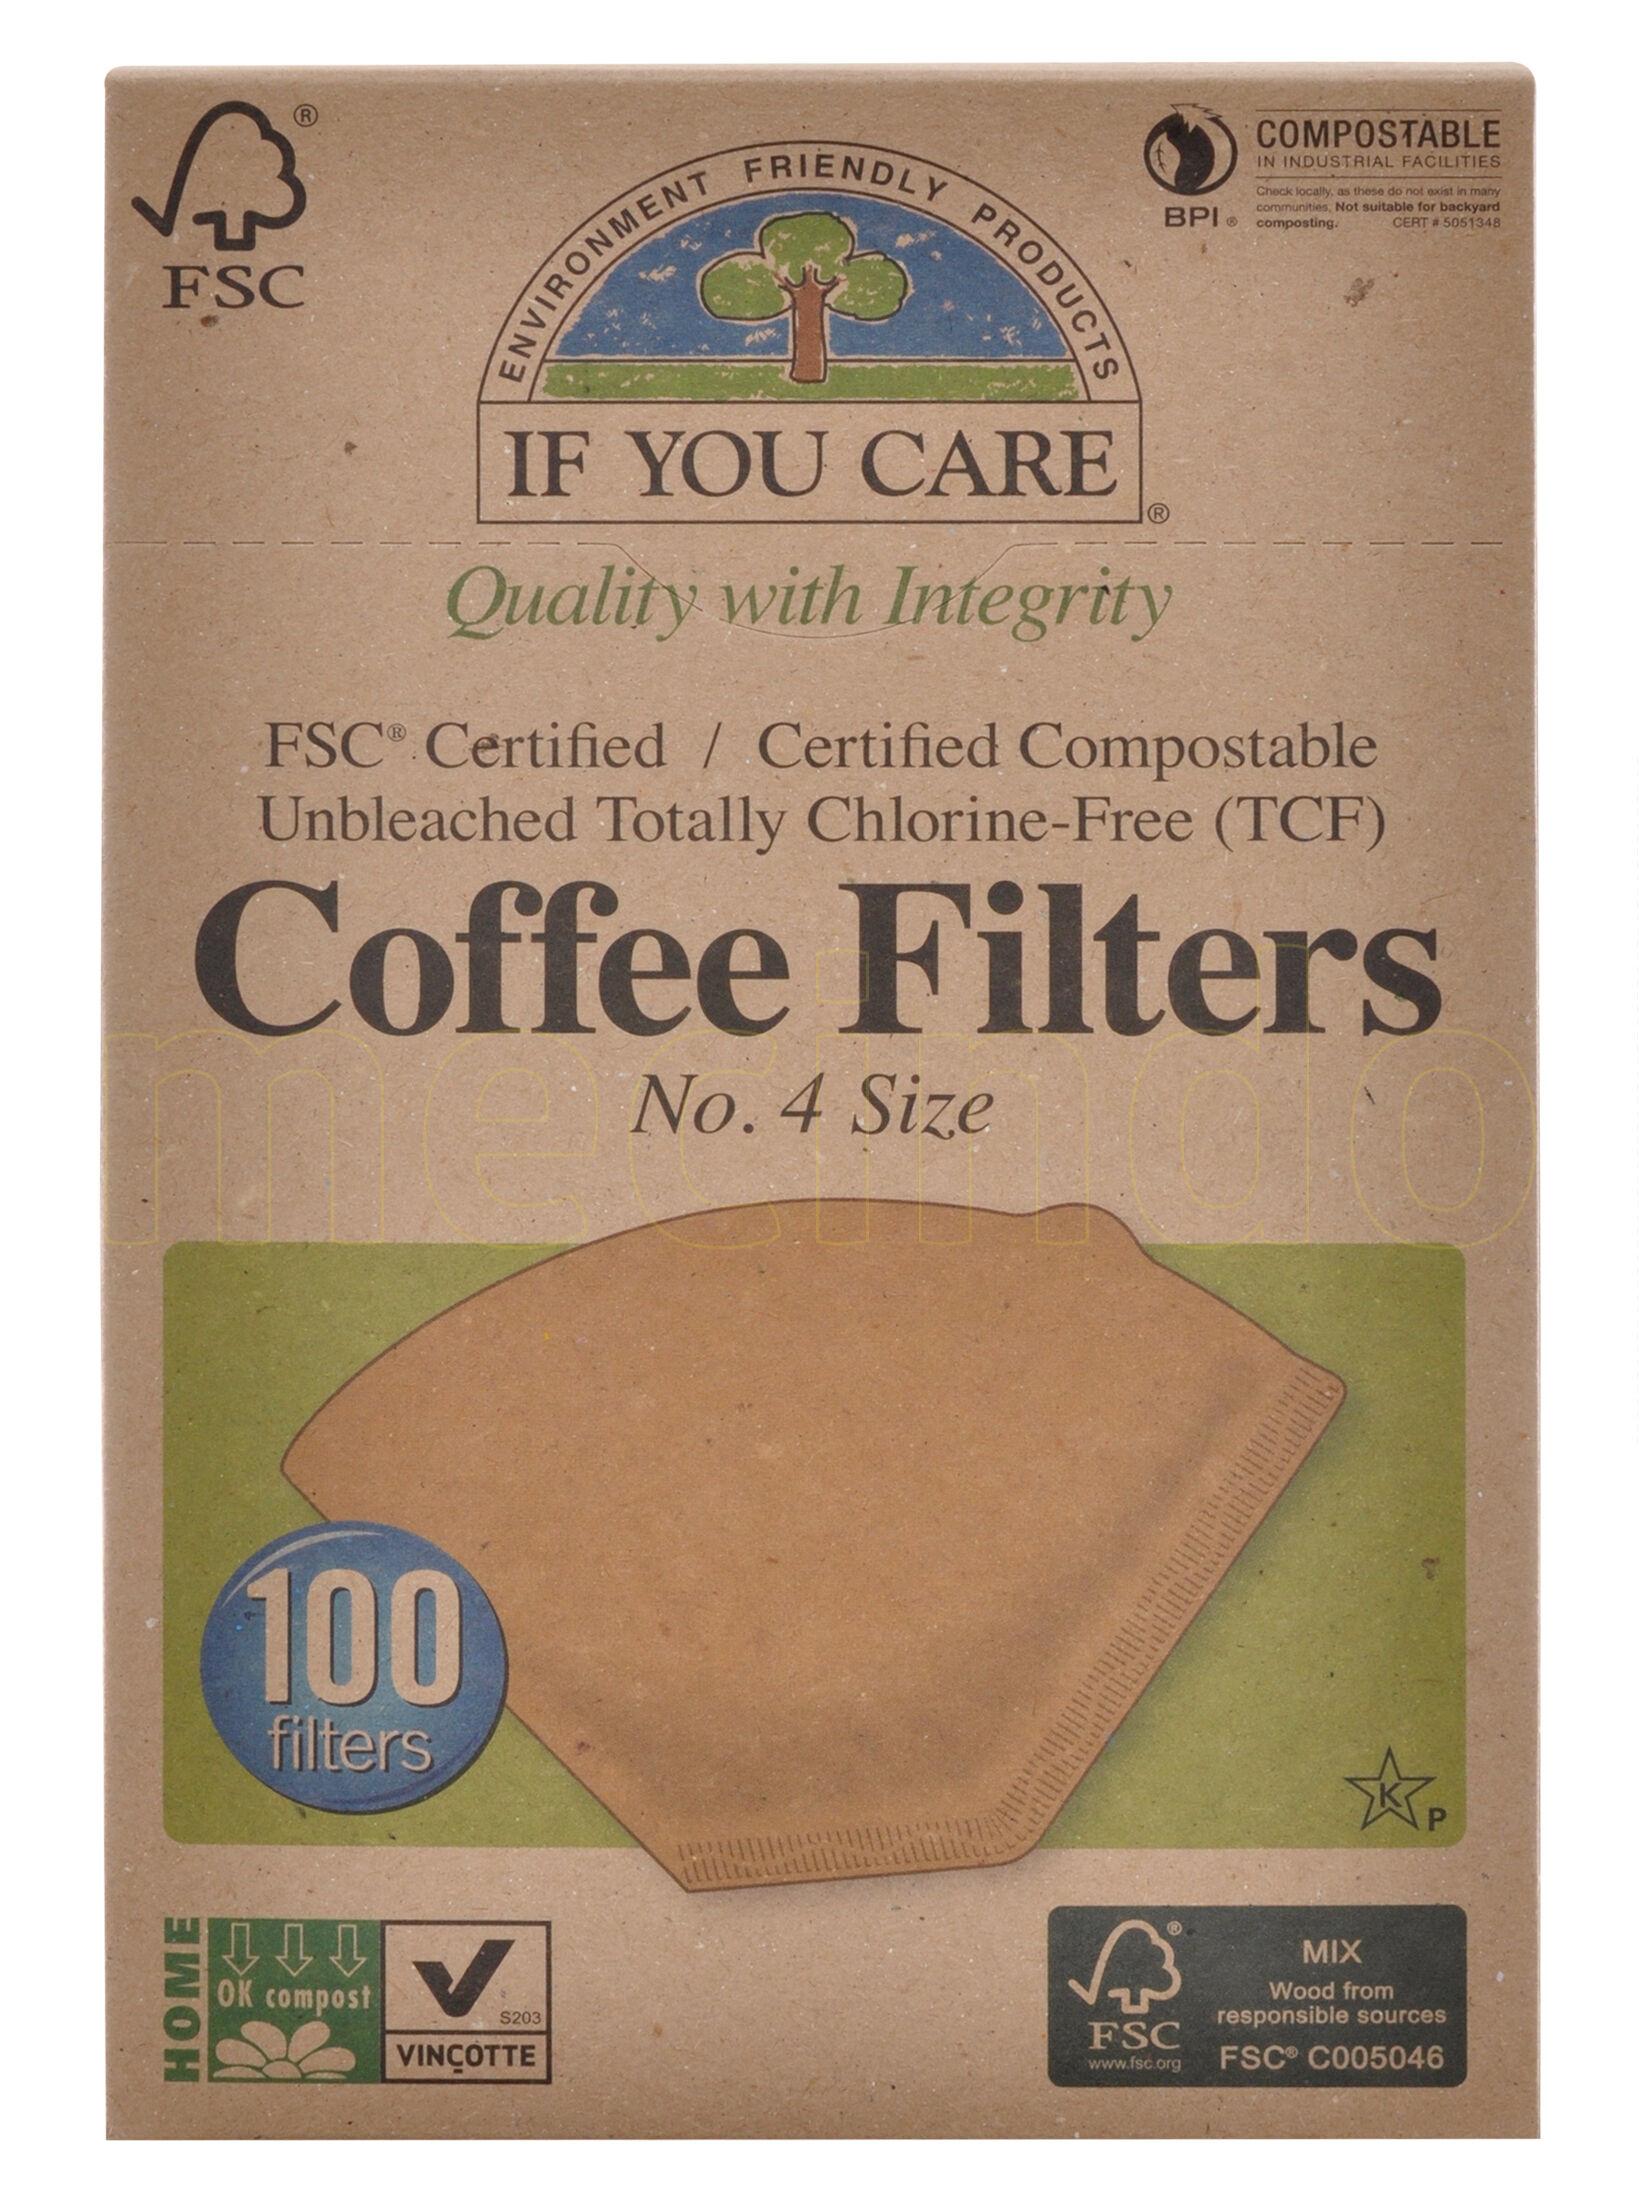 If you care Kaffefilter Ubleget No. 4 - 100 stk